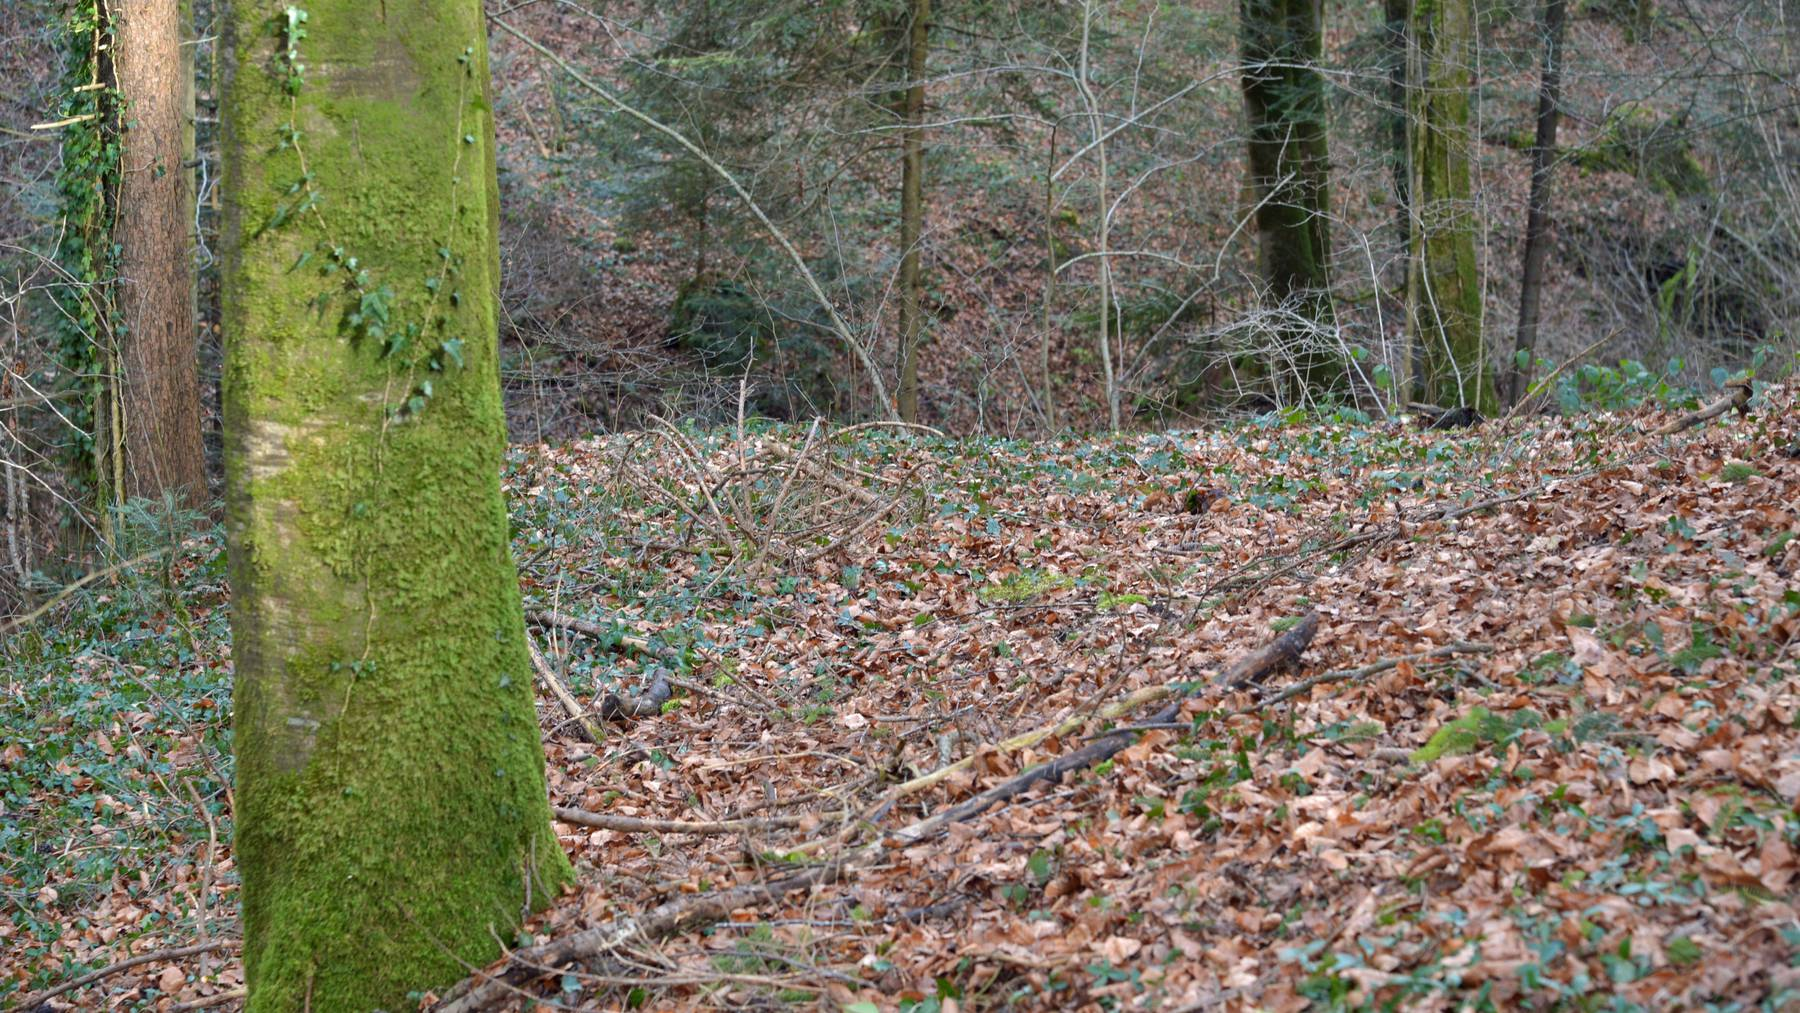 In diesem Waldstück wurde die tote Frau gefunden.